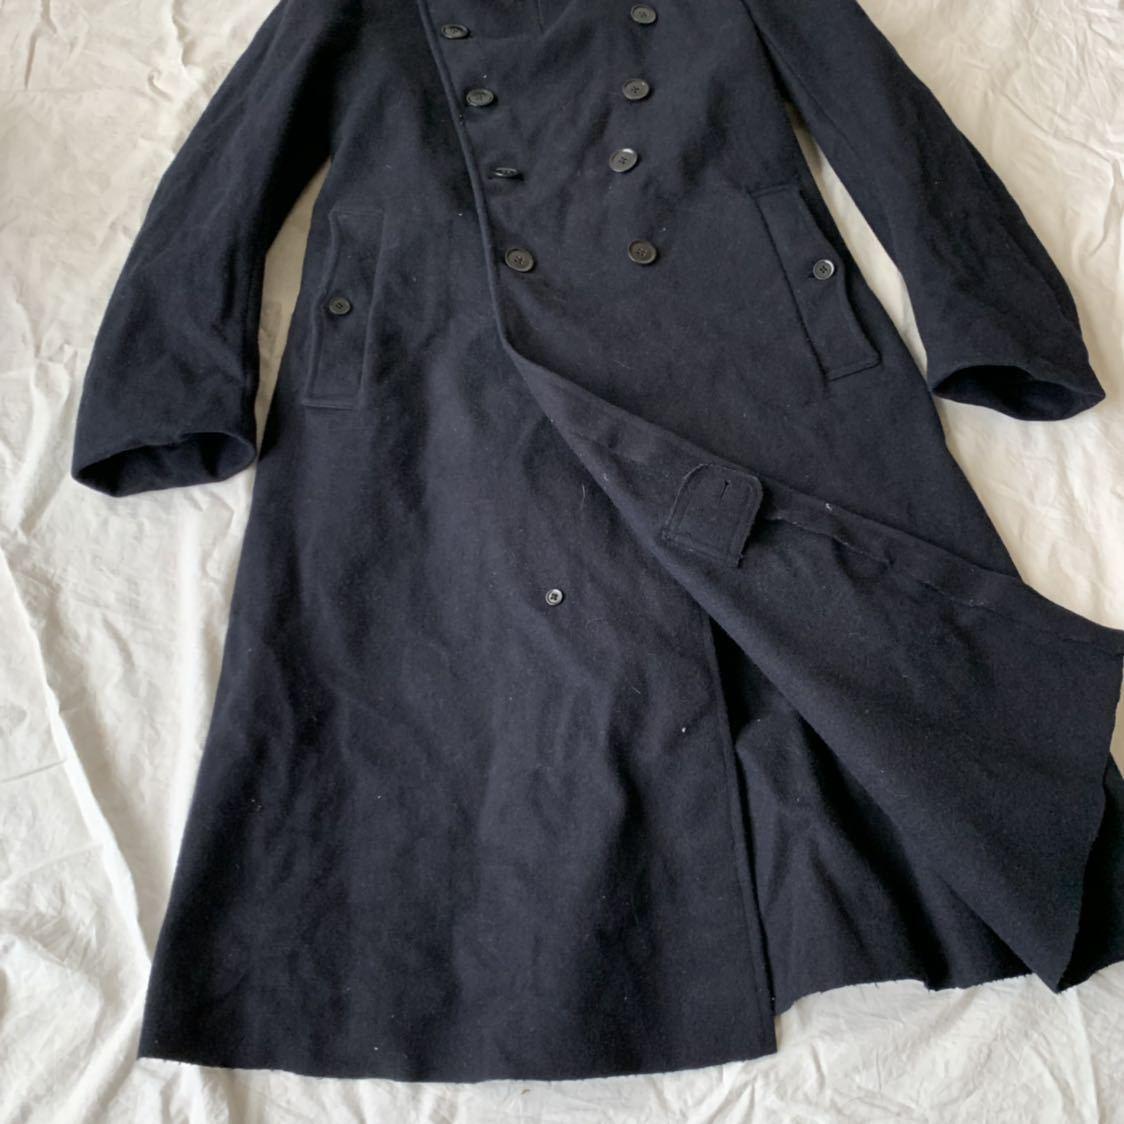 40s 50s イギリス ビンテージ ヘビーメルトン ファイヤーマン コート ウール ワーク 濃紺 ピーコート ダッフル _画像9